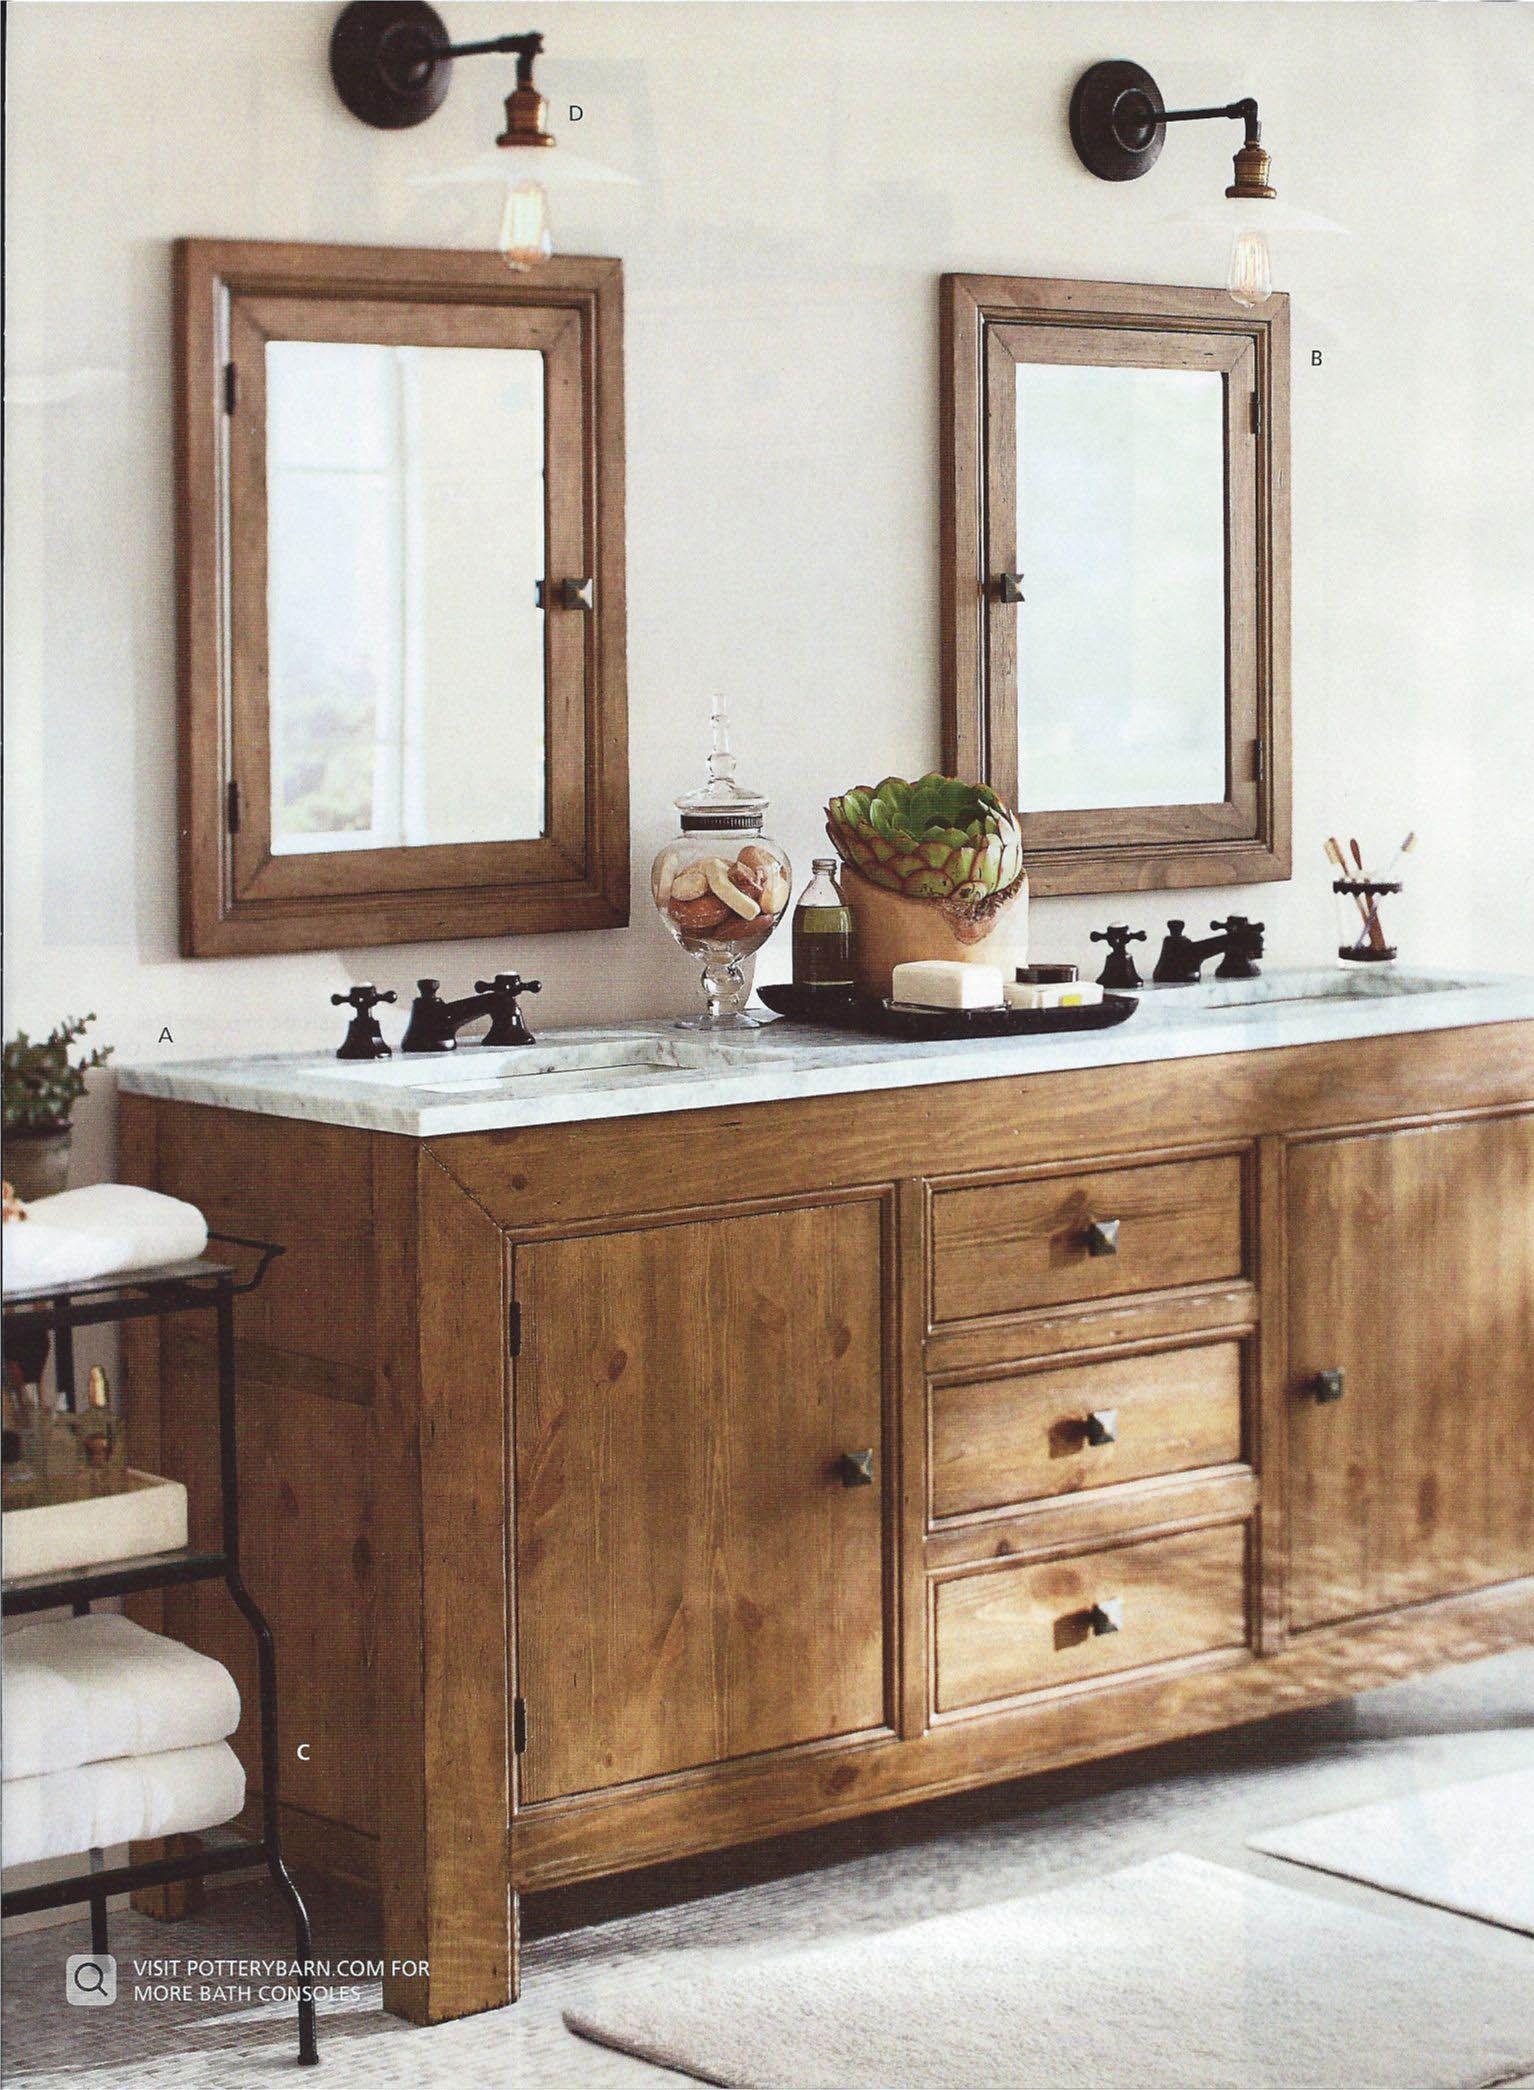 Amazing Rustic Bathroom Vanities South Africa Only On Planetdecors Com Rustic Bathroom Vanities Bathroom Vanity Decor Bathroom Vanity Designs